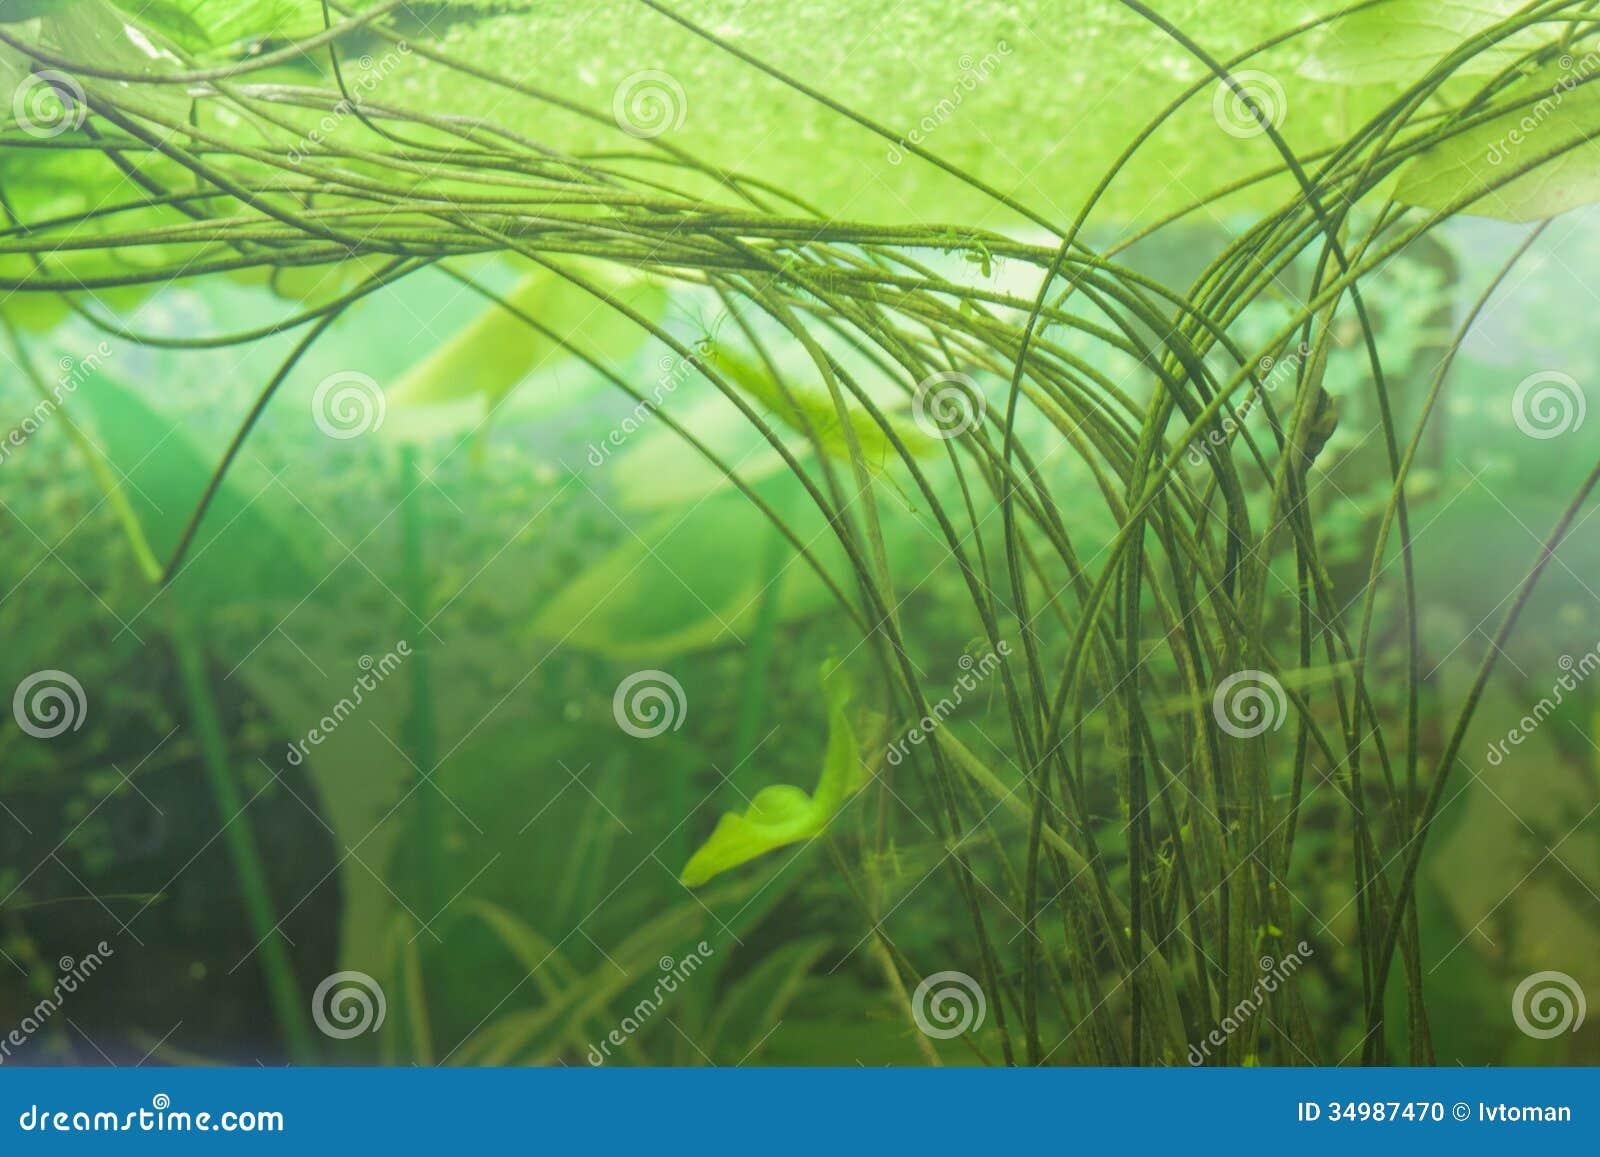 Decorative Aquarium Plants Stock Photo Image 34987470